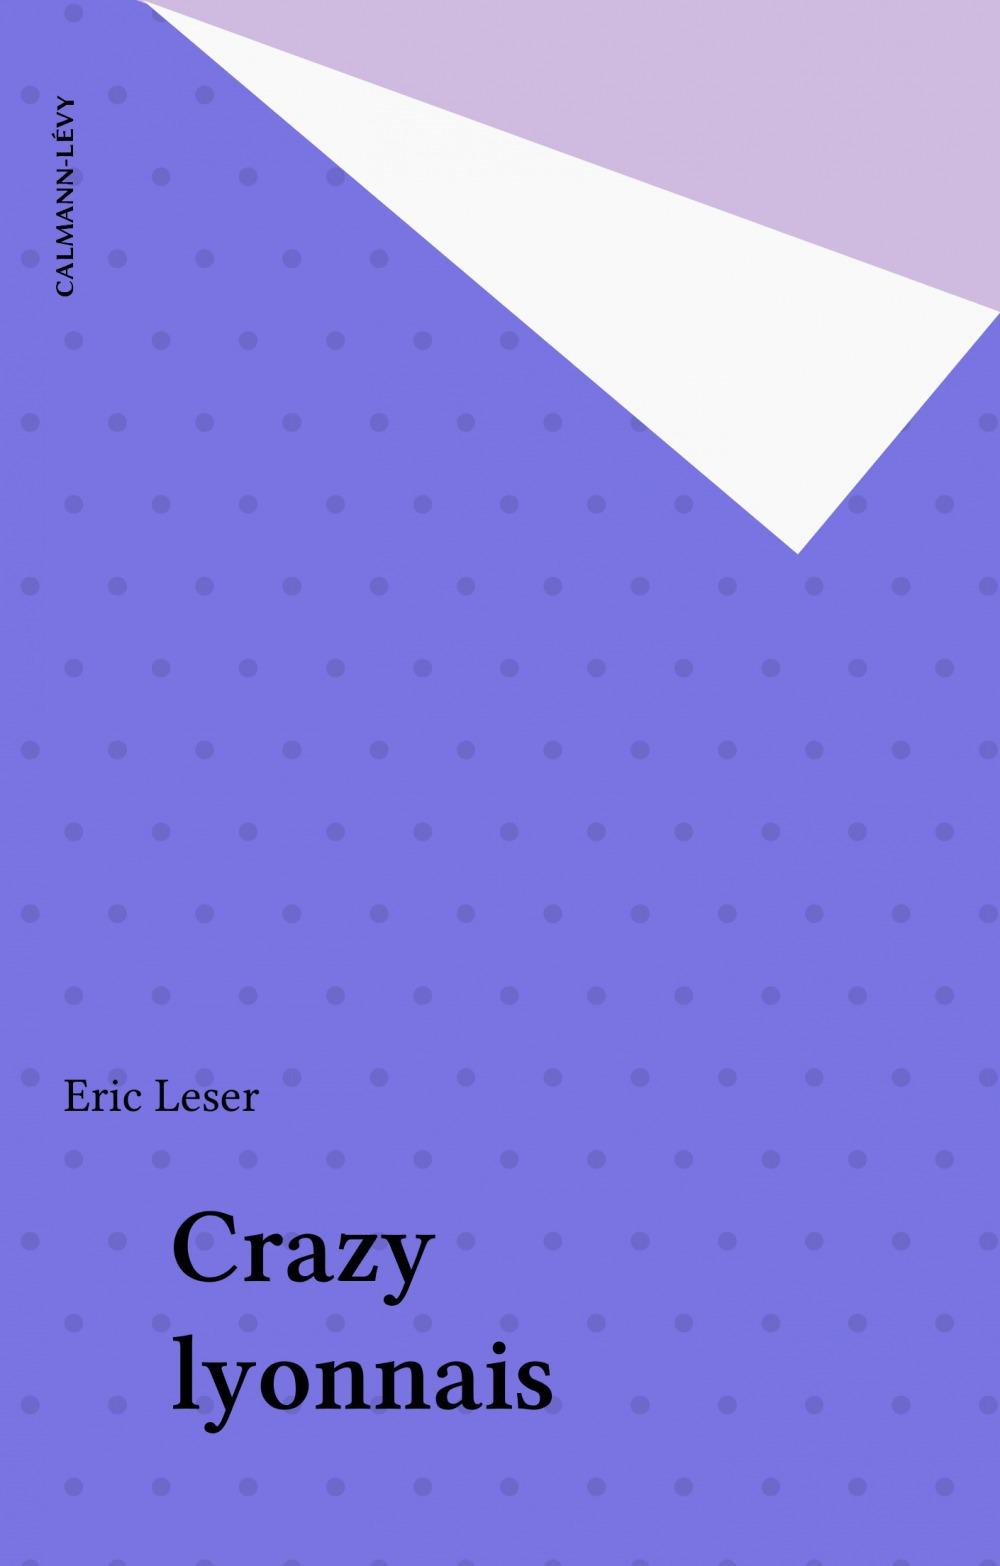 Eric Leser Crazy lyonnais